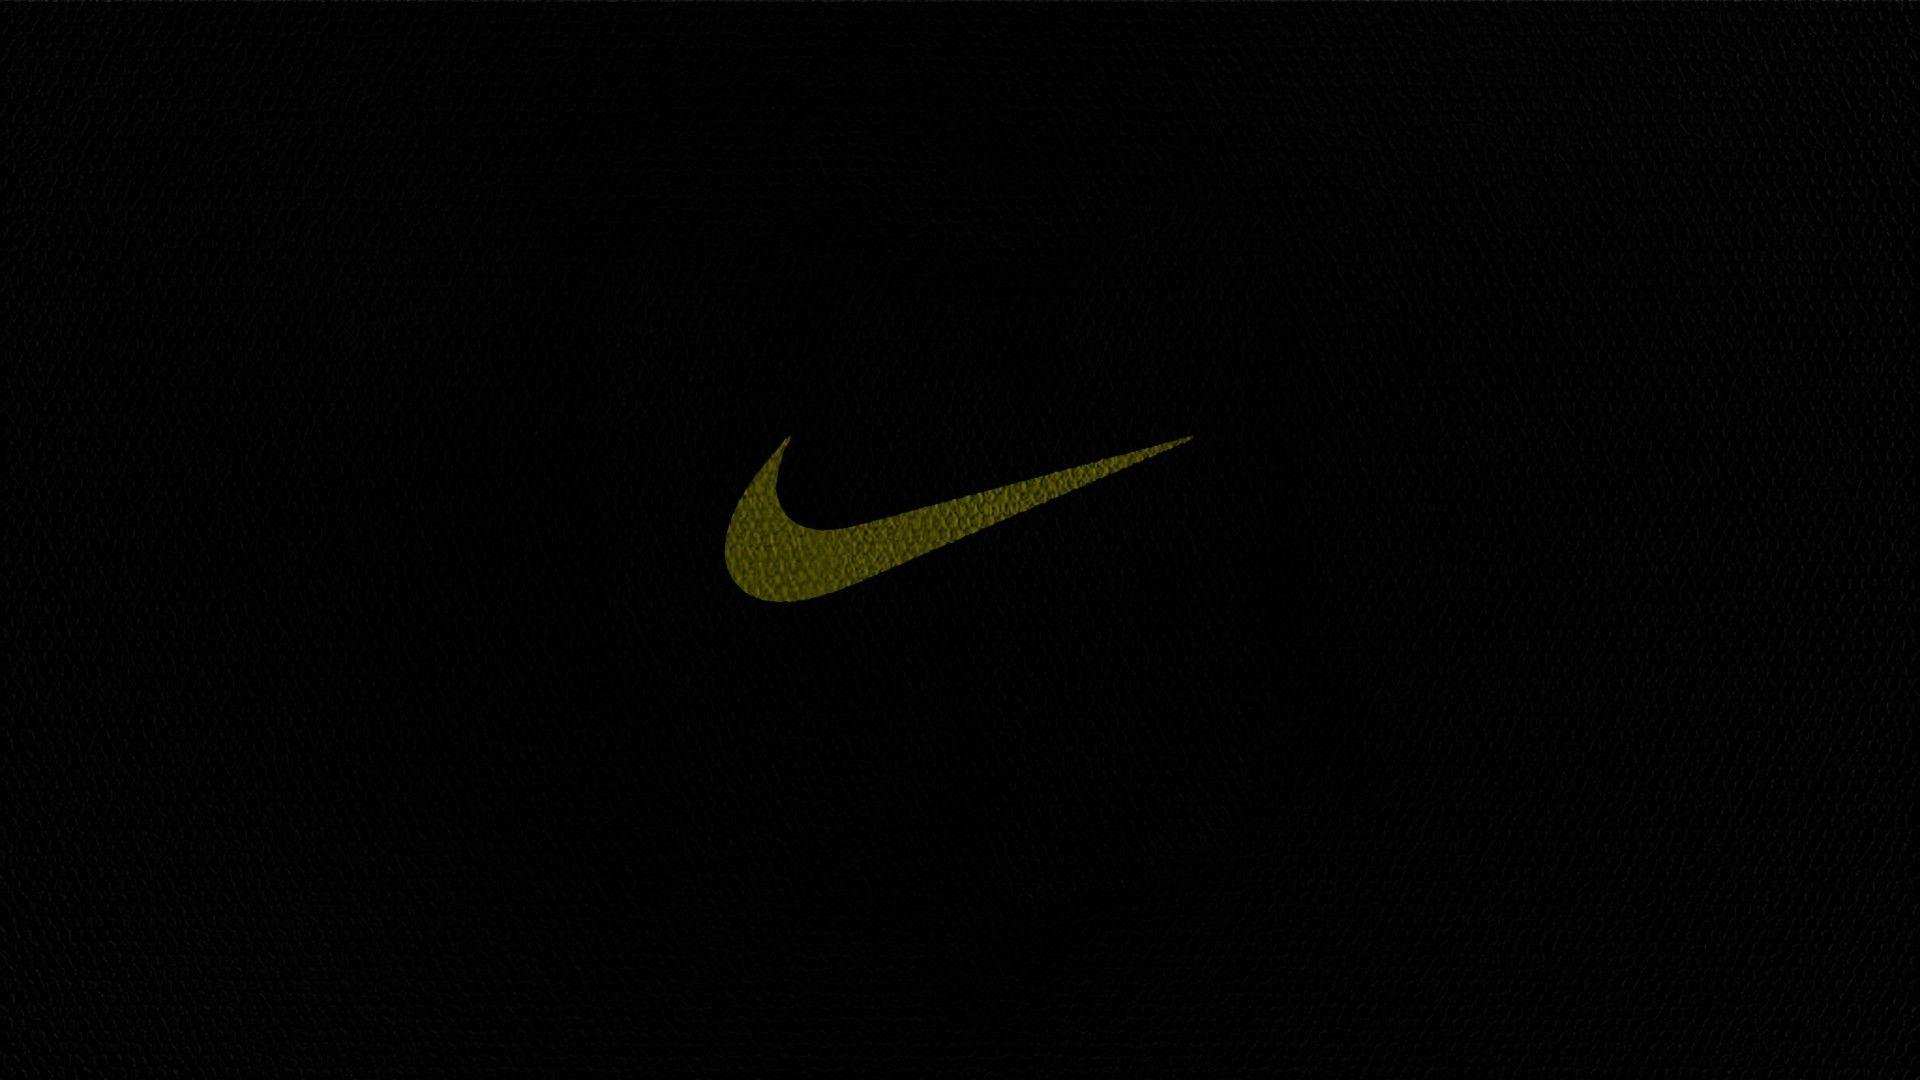 Find More Nike Wallpaper Hd Wallpaper At Httphdwewebcomout